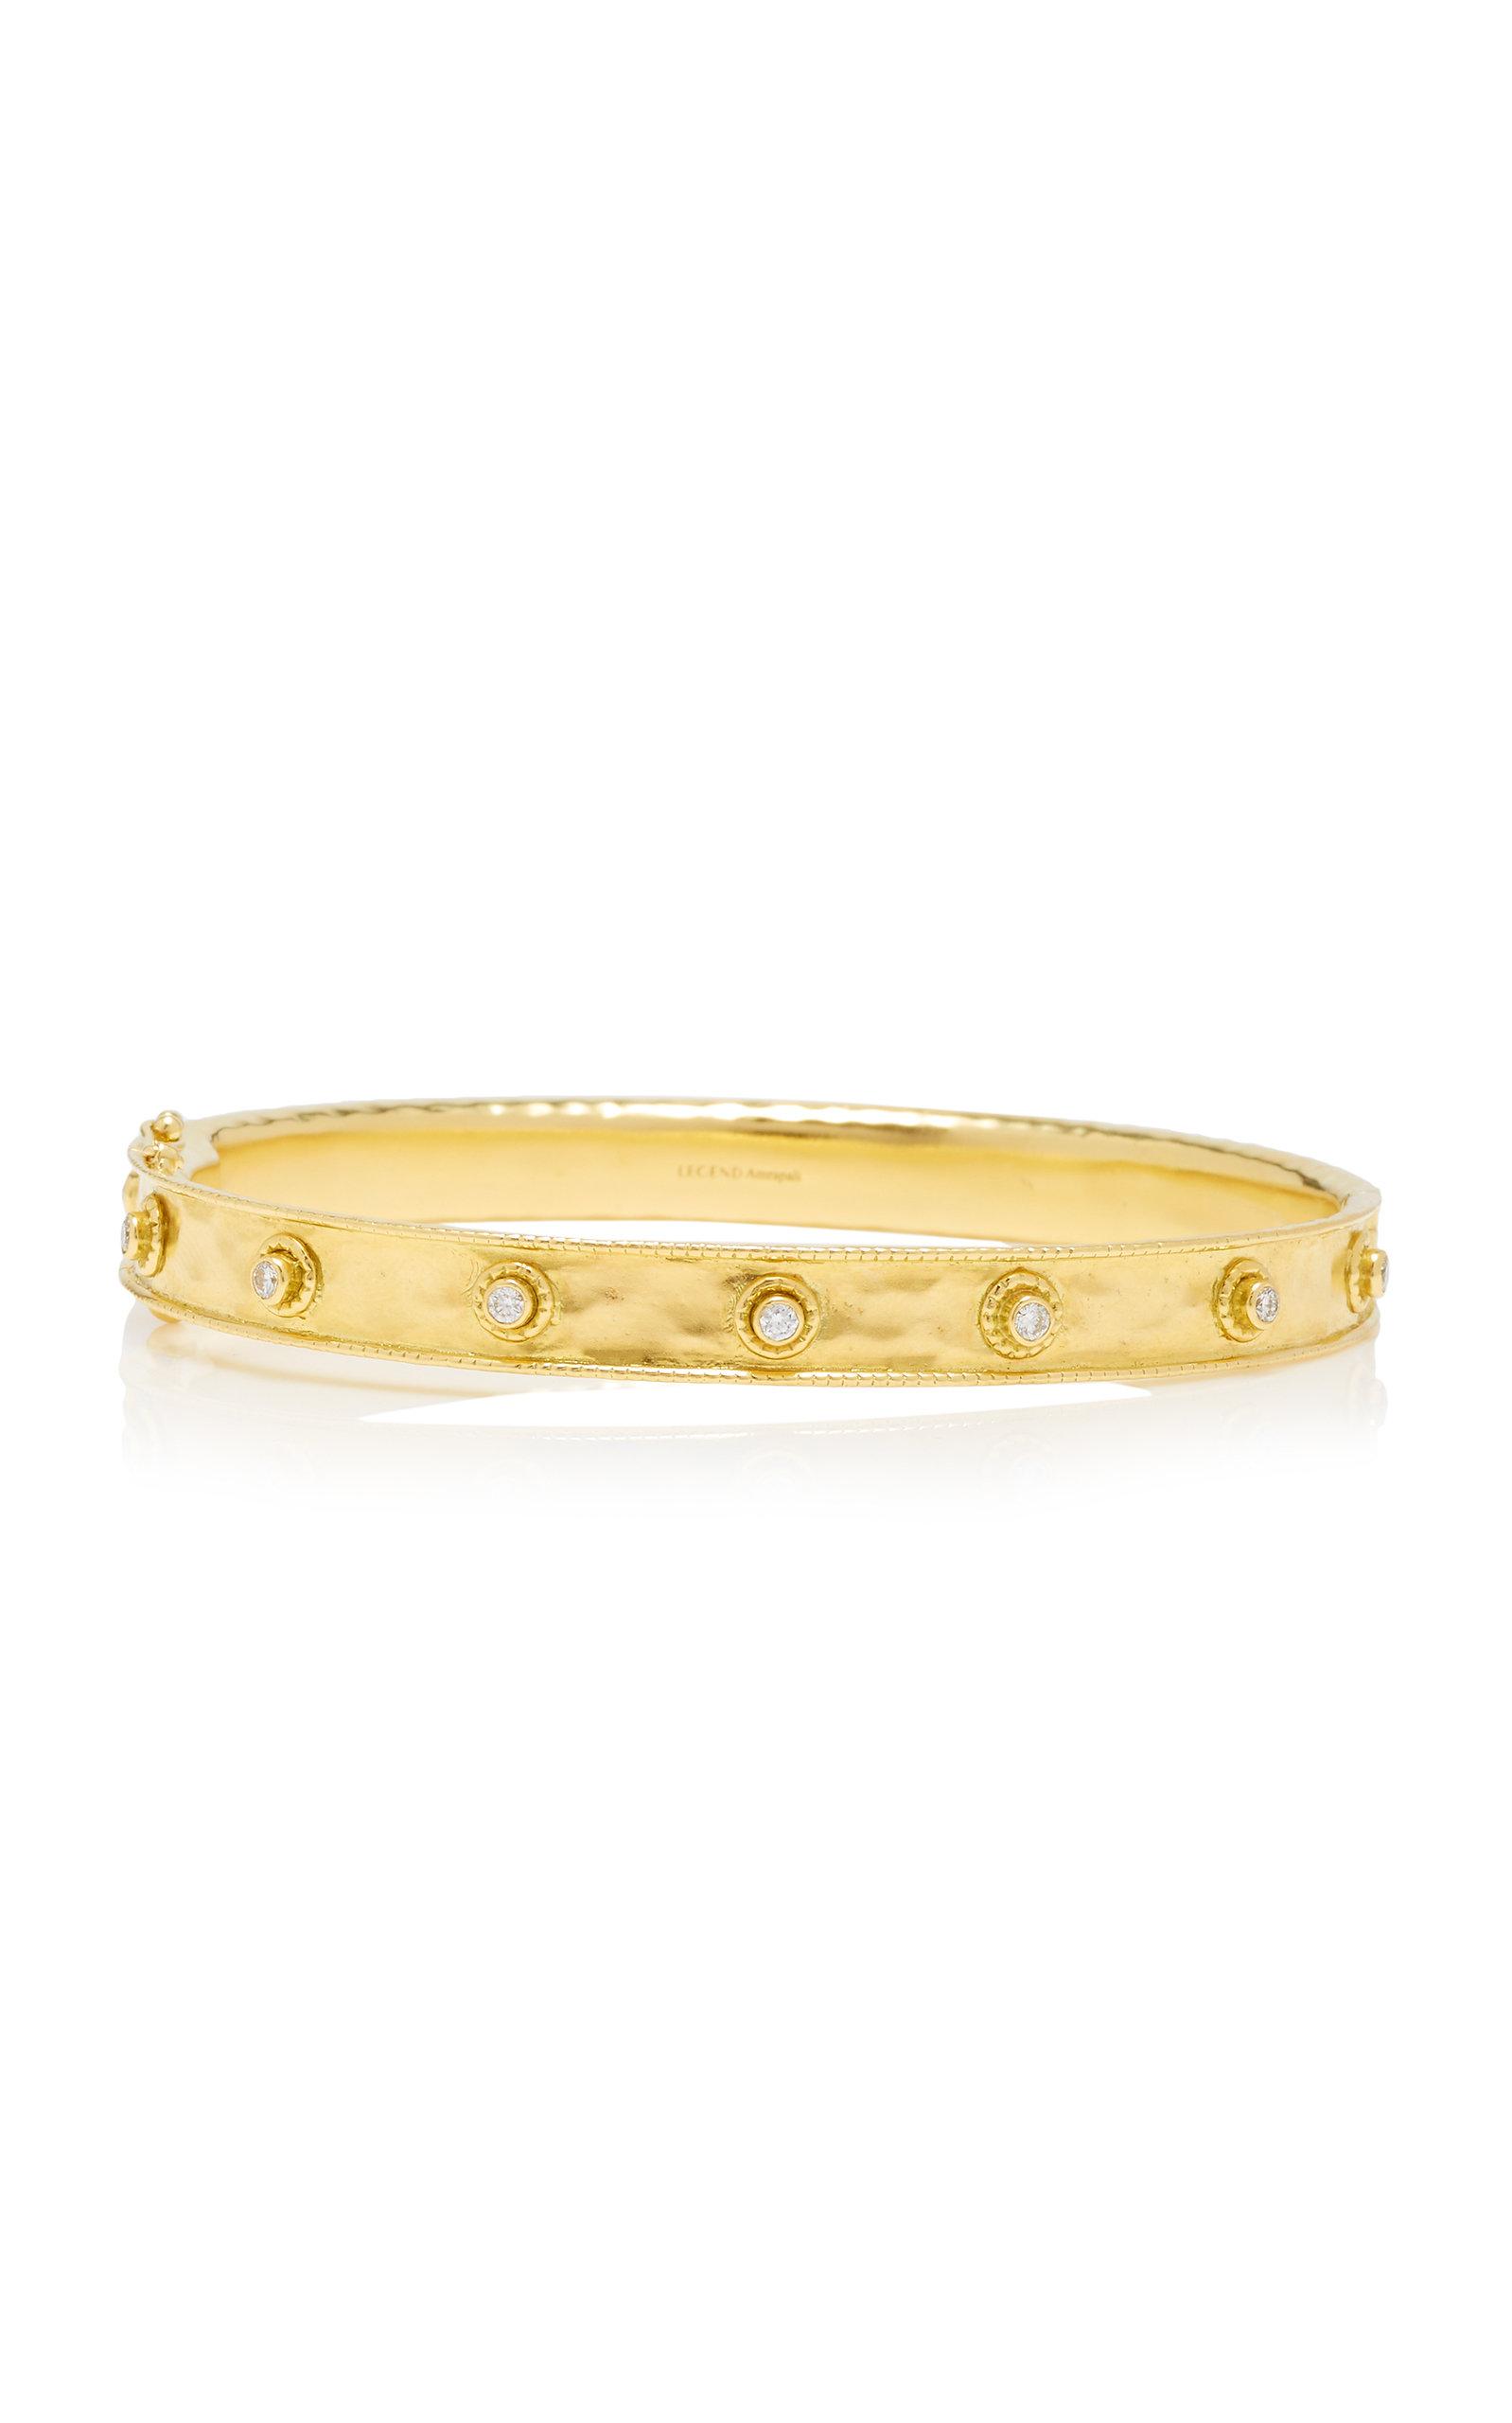 Women's Revati 18K Gold and Diamond Bangle